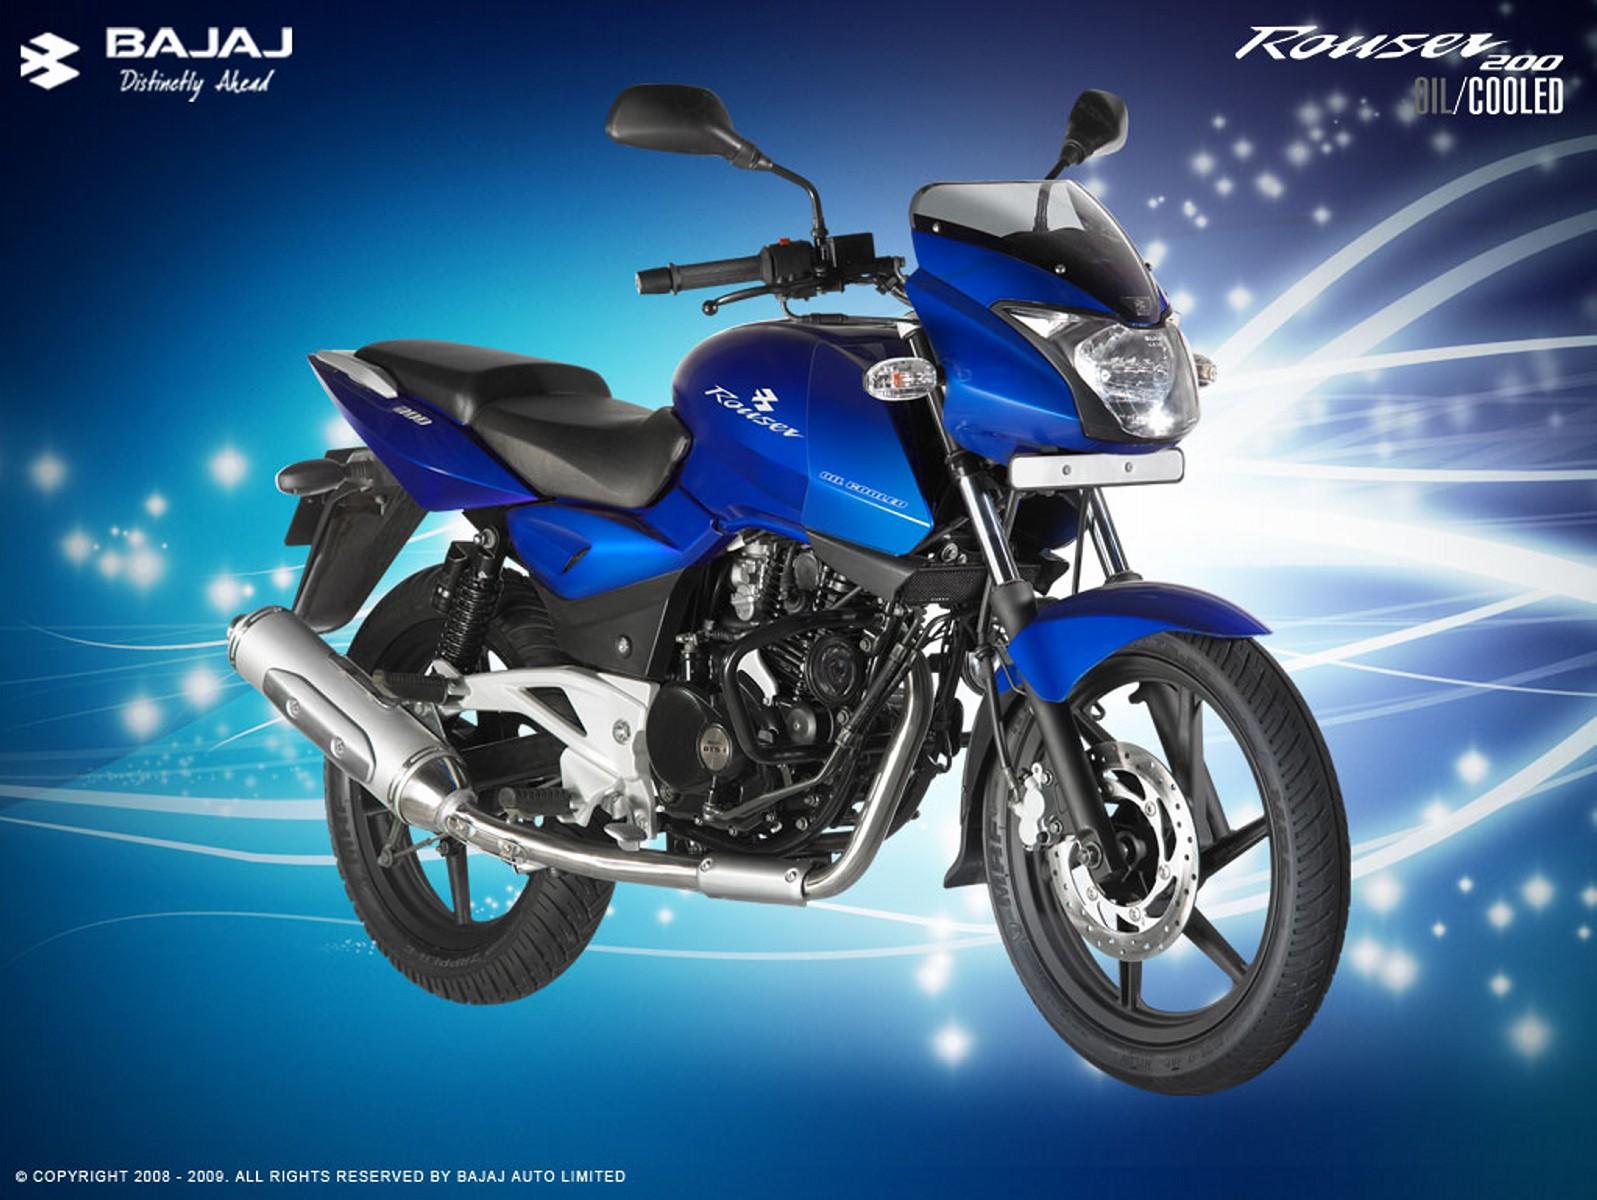 Motorcycle Pictures: Bajaj Rouser 200